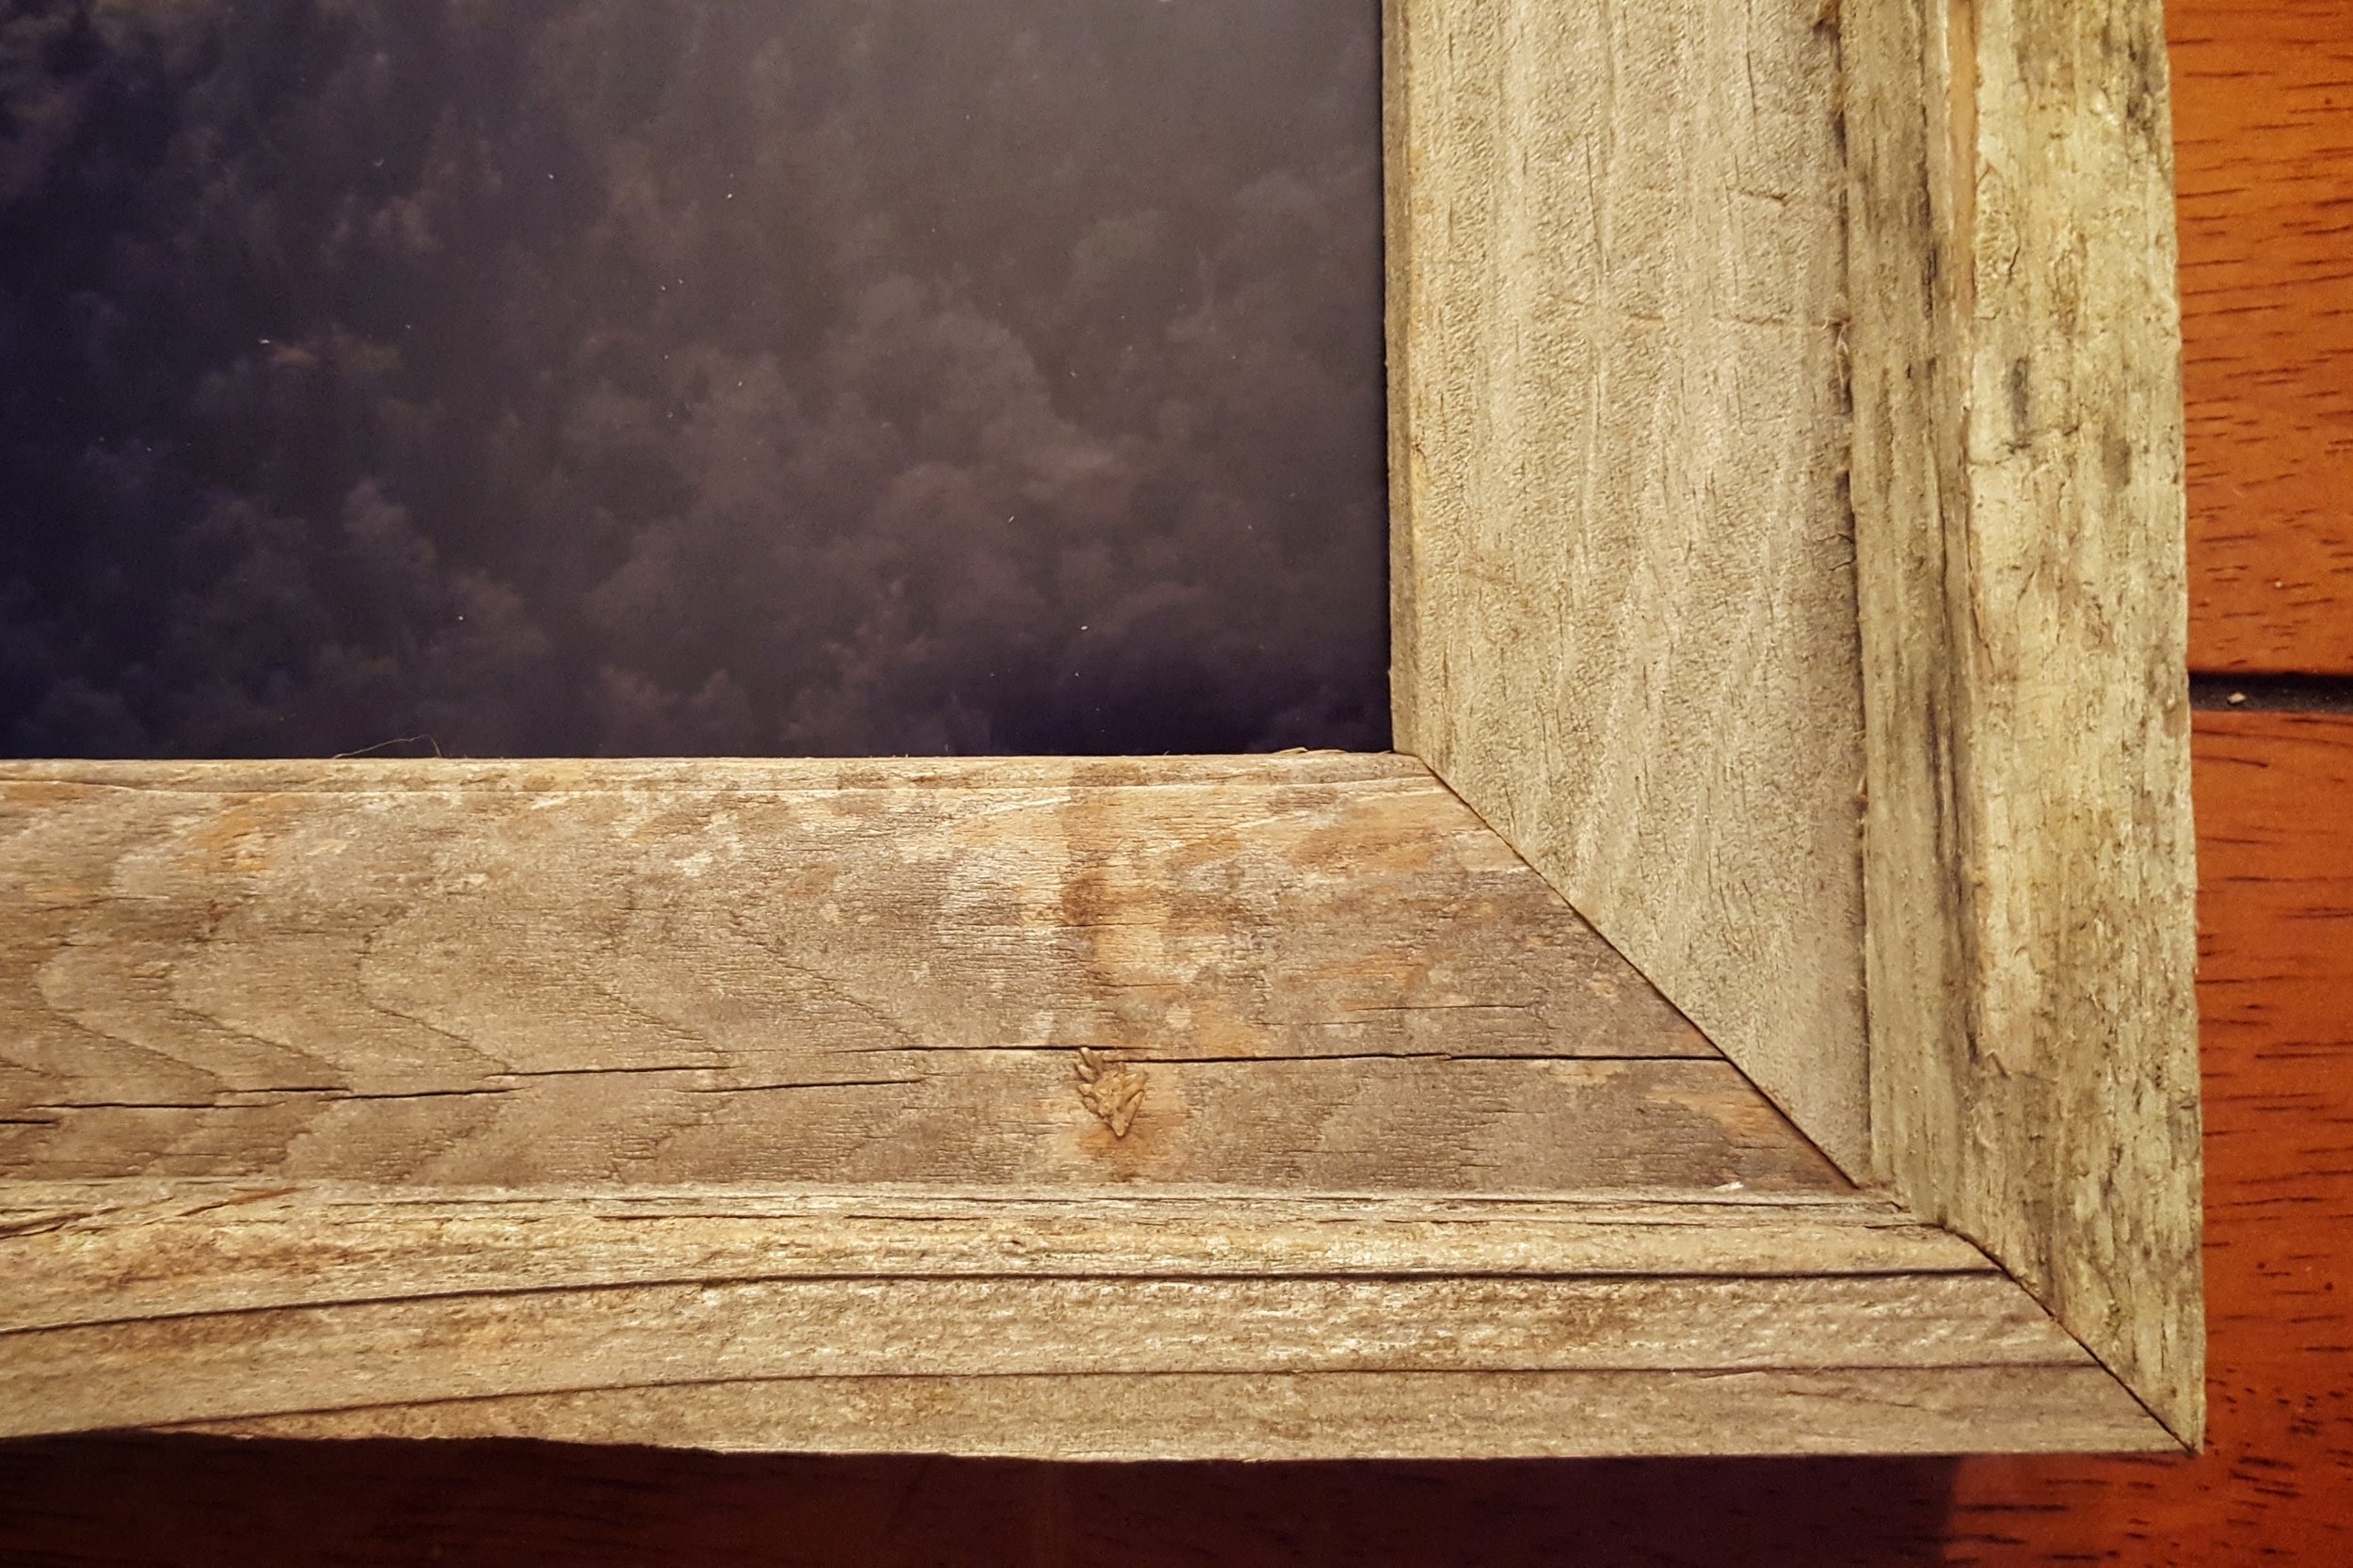 Close-up view of corner framing.